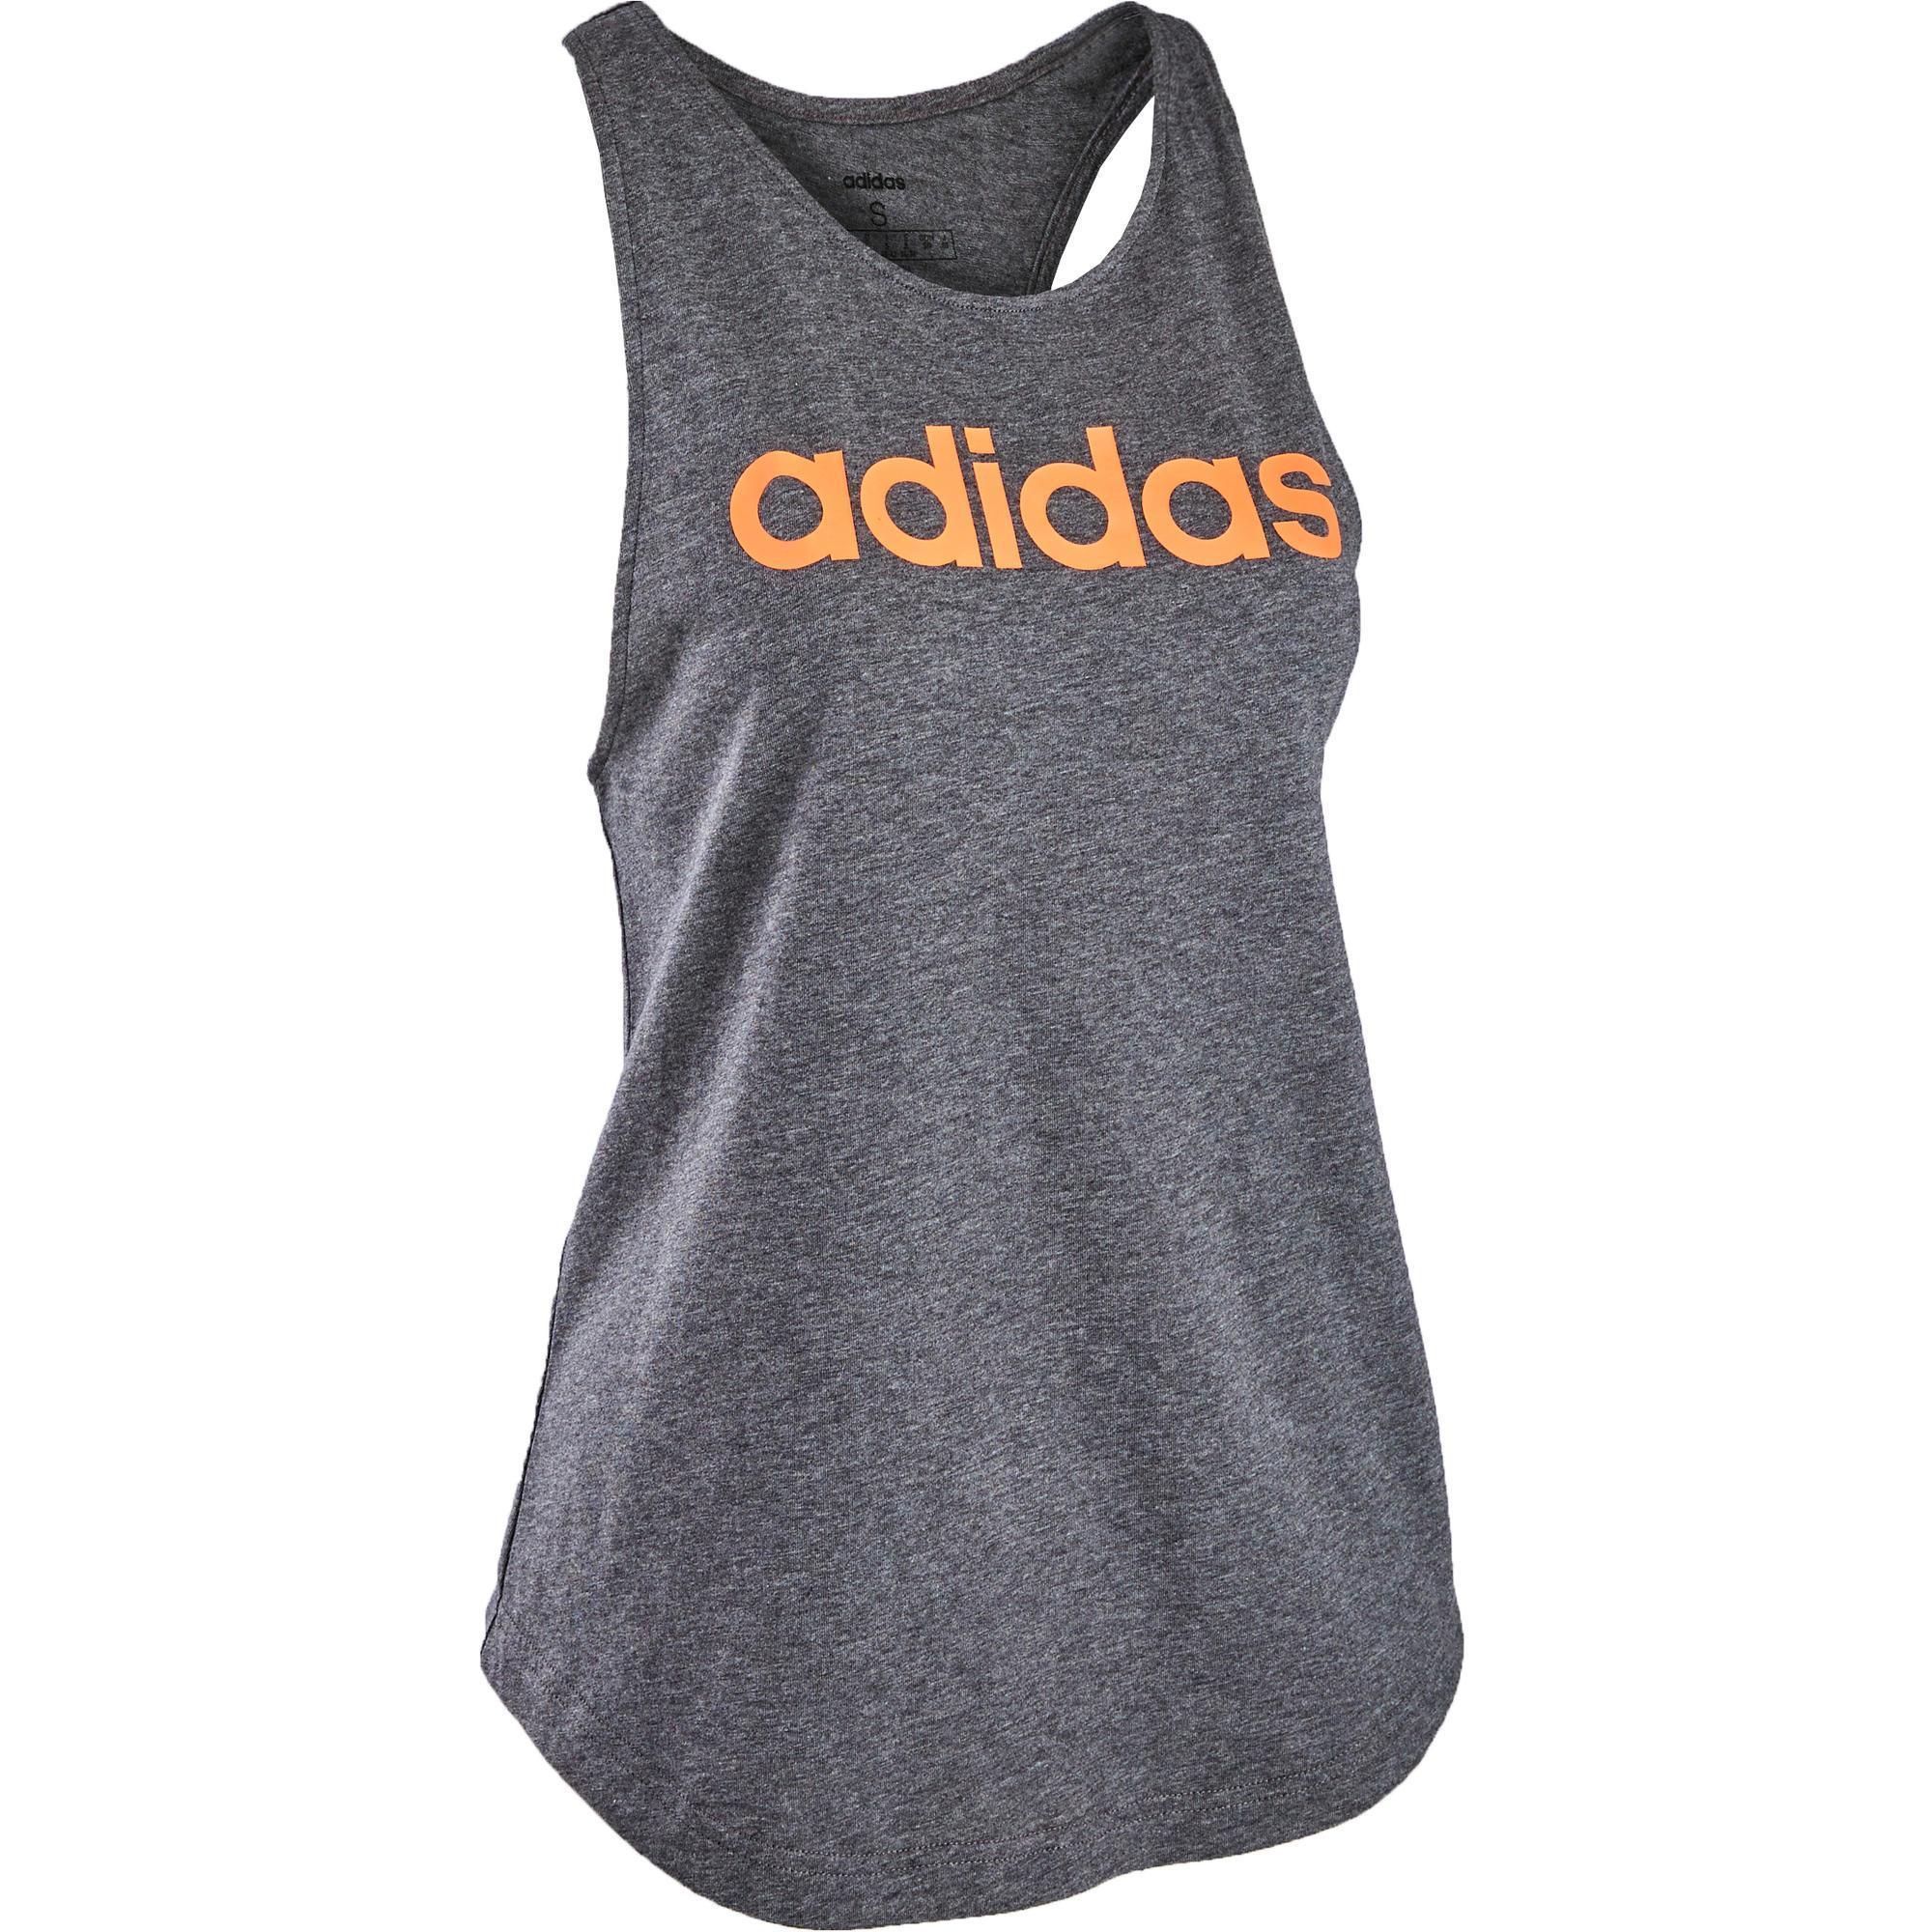 Camiseta de mujer ADIDAS